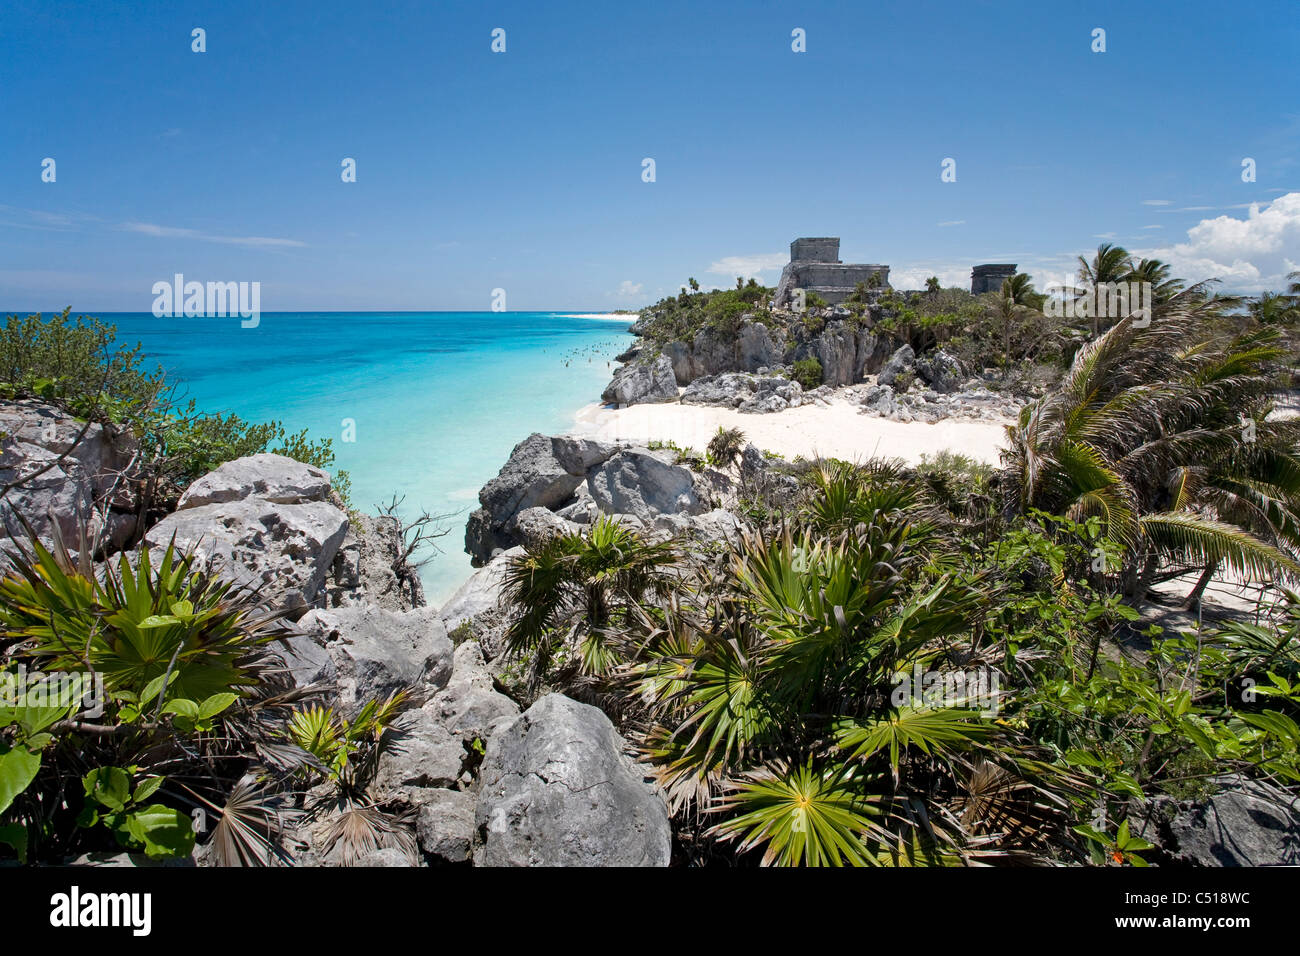 Mayastaetten von Tulum Quintana Roo, Yukatan, Mexiko,  Tulum ruins, Yucatan, Mexico - Stock Image